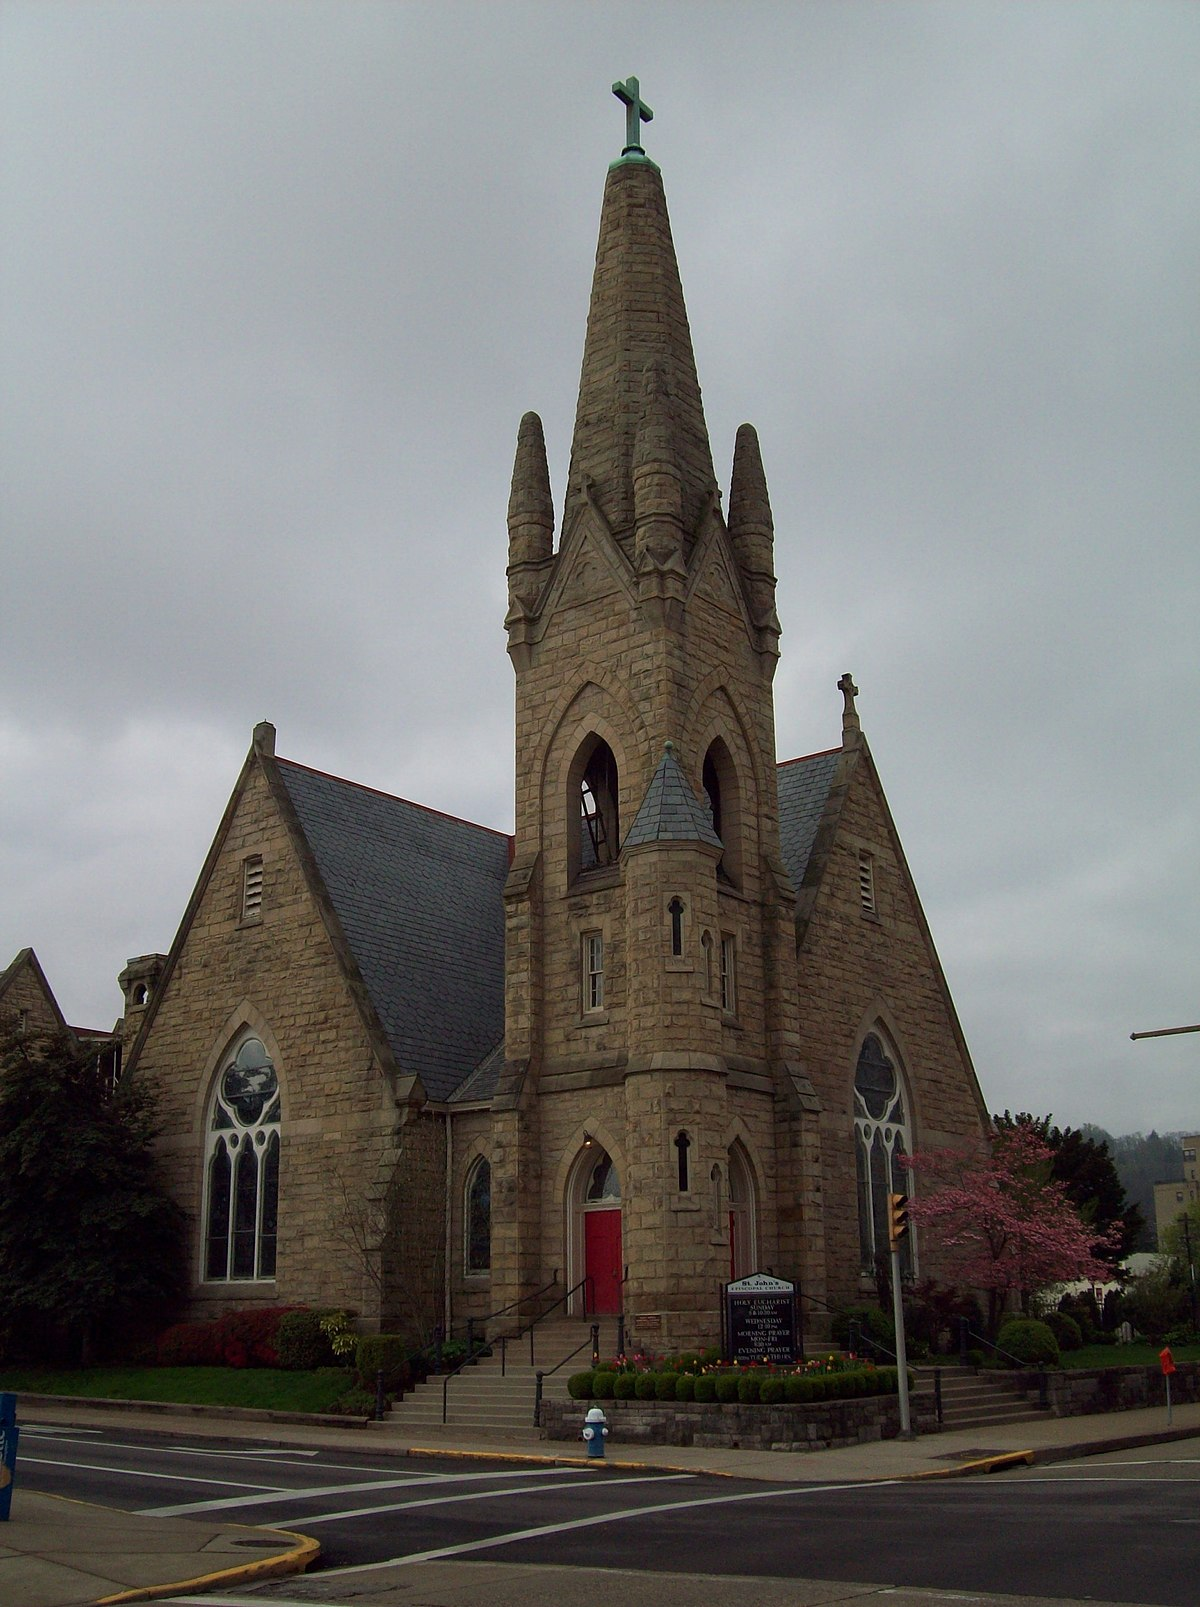 [Image: 1200px-St_Johns_Episcopal_Apr_09.JPG]